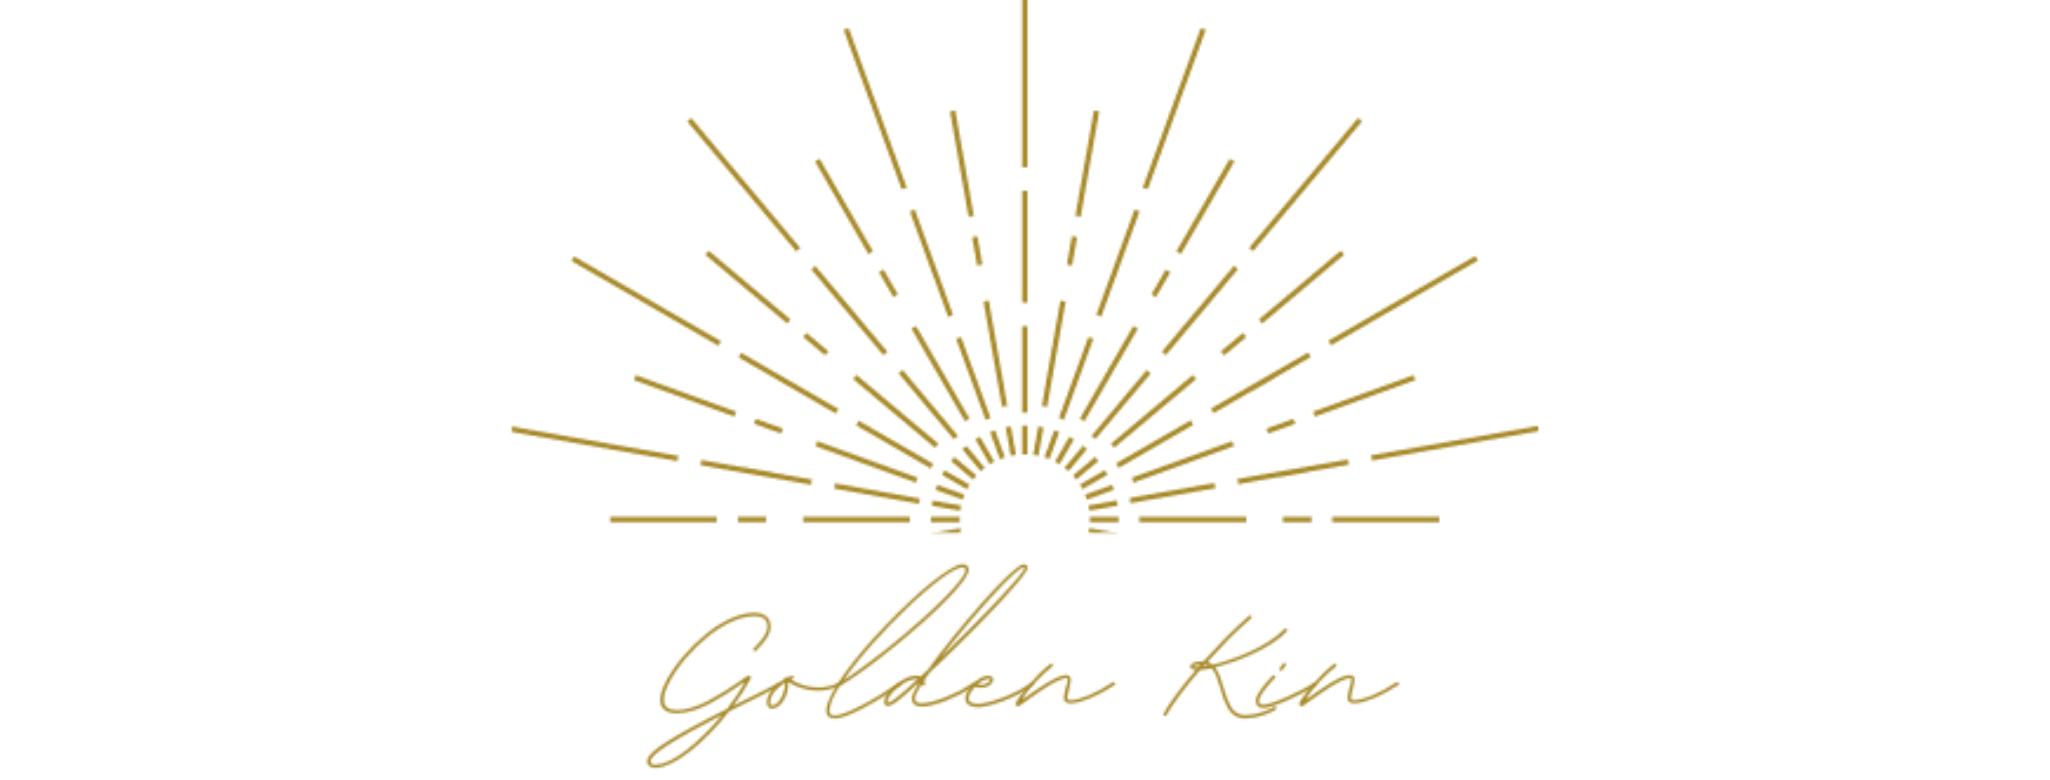 Golden Kin